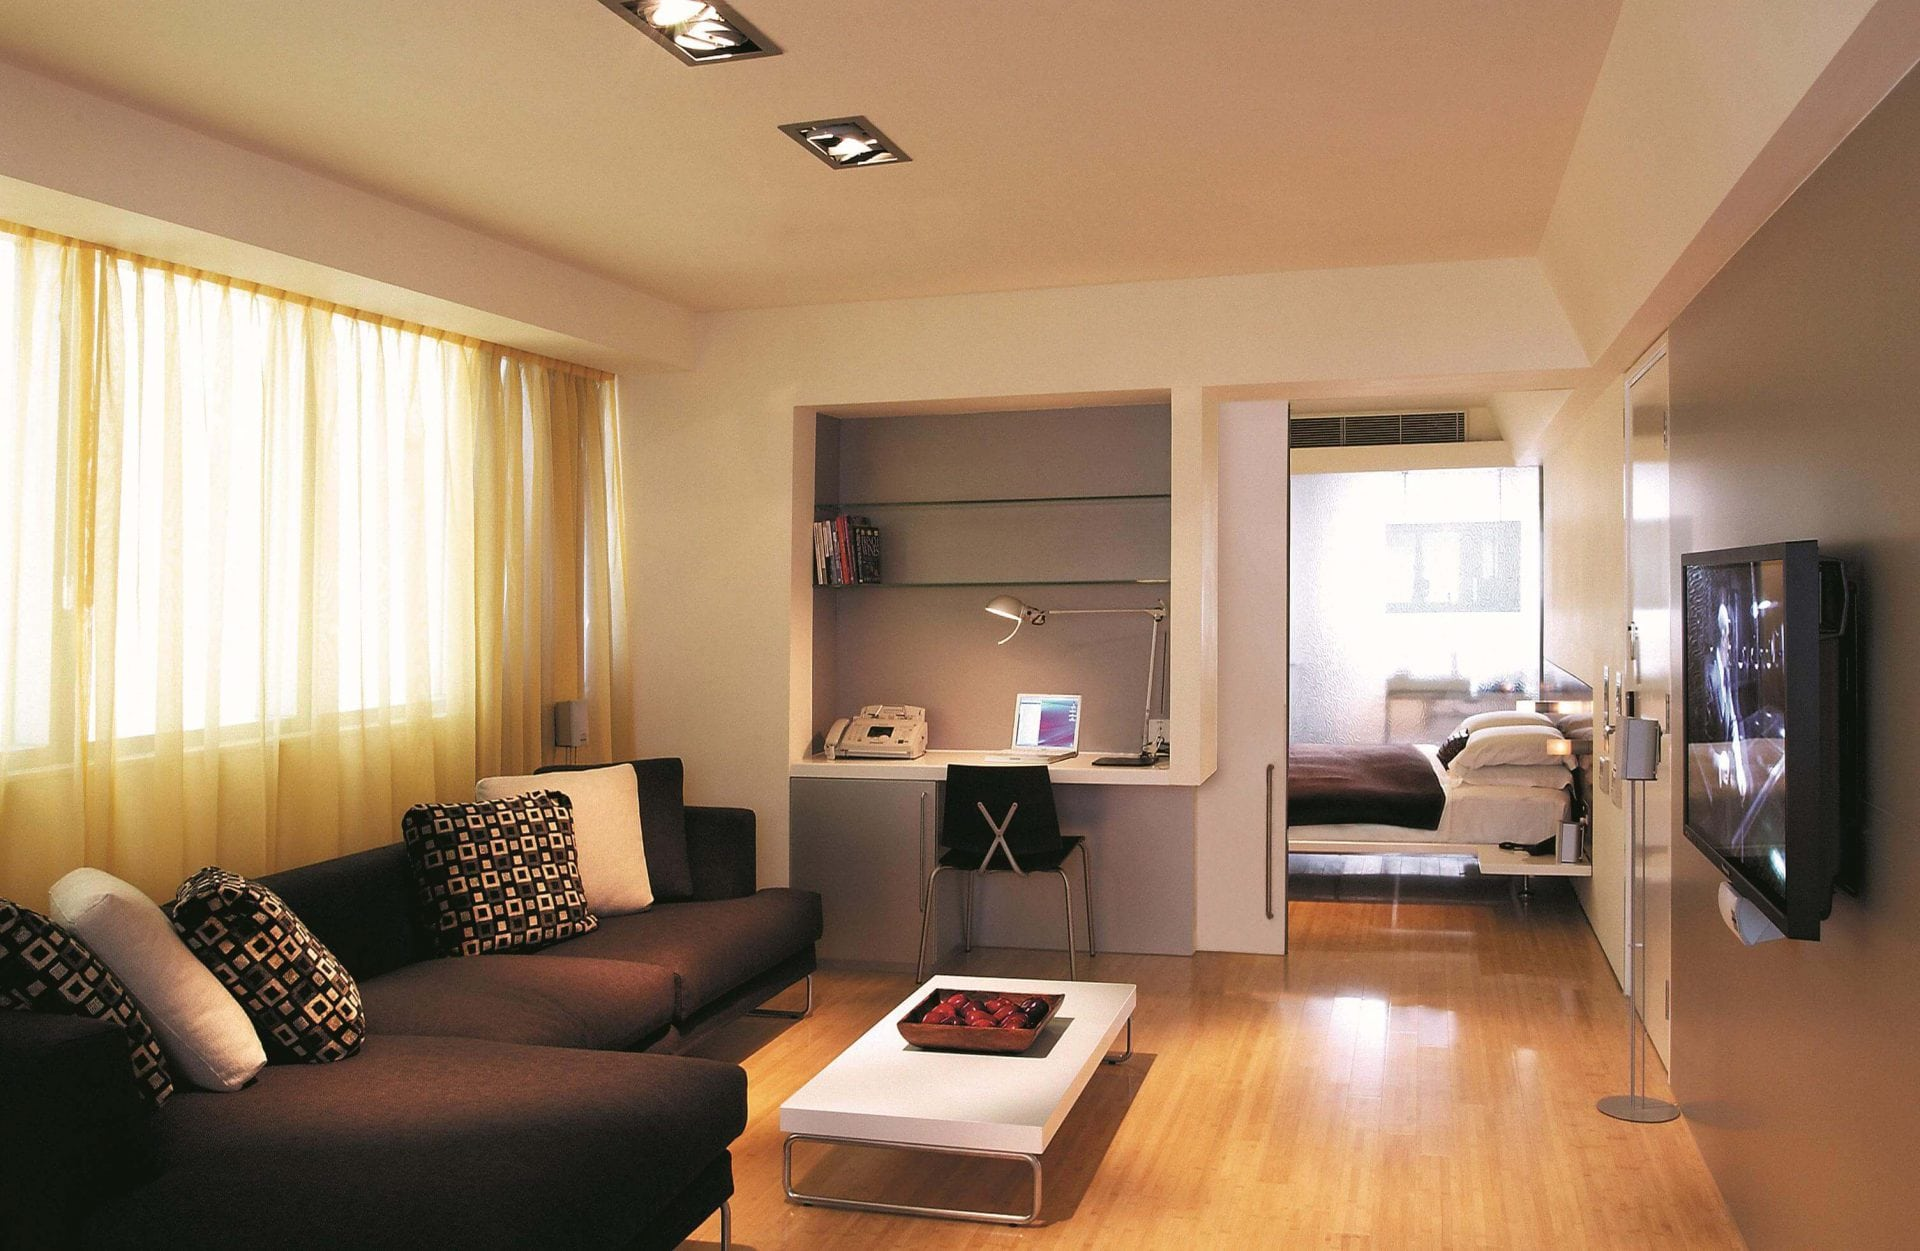 Simple yet effective minimalistic room decoration with pastel scheme